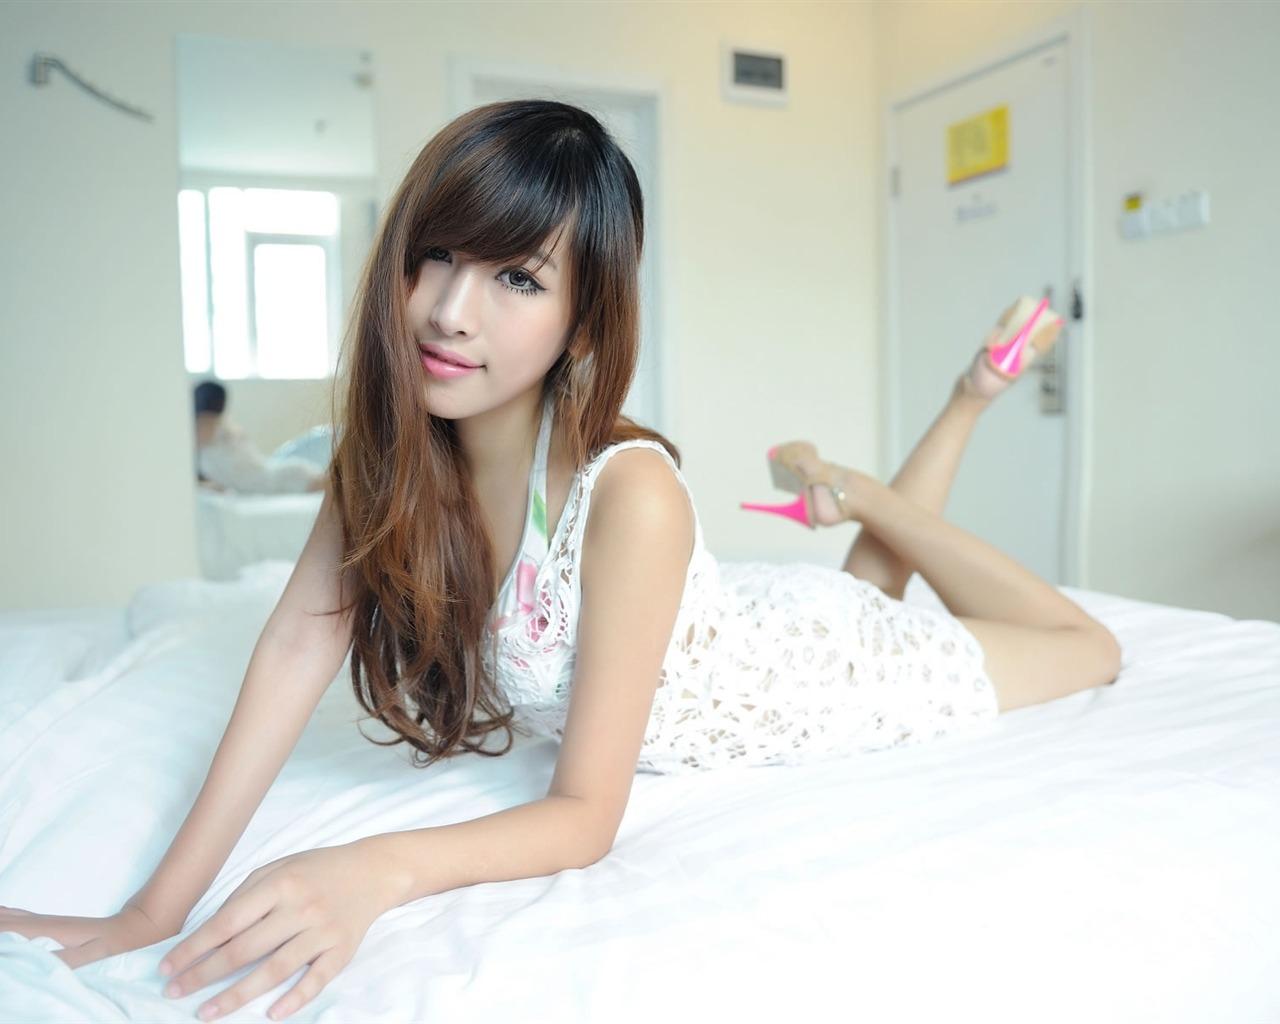 White long legged beauty pure photo HD wallpaper 04 1280x1024